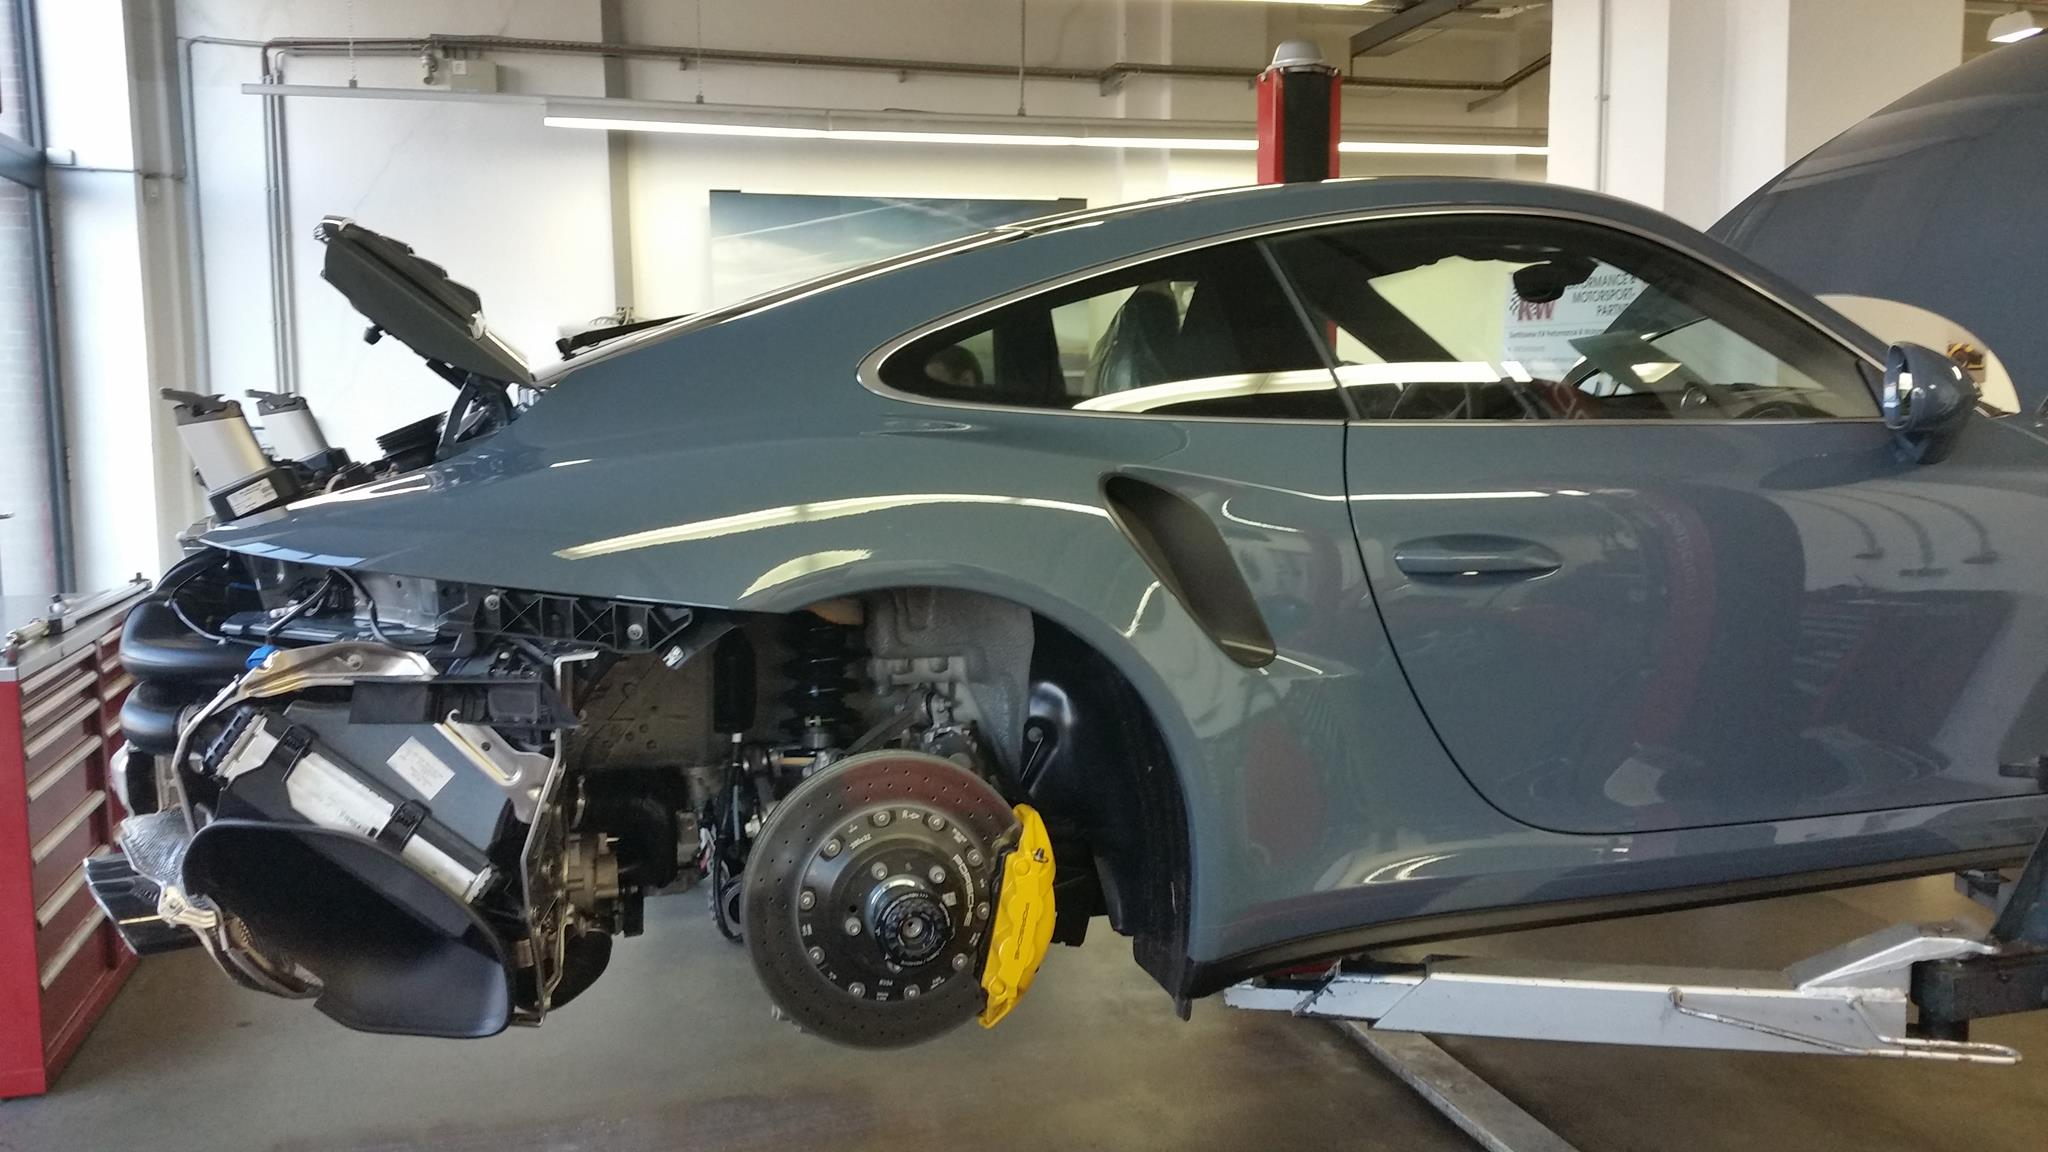 2017 porsche 911 turbo s loses bumpers in striptease, looks